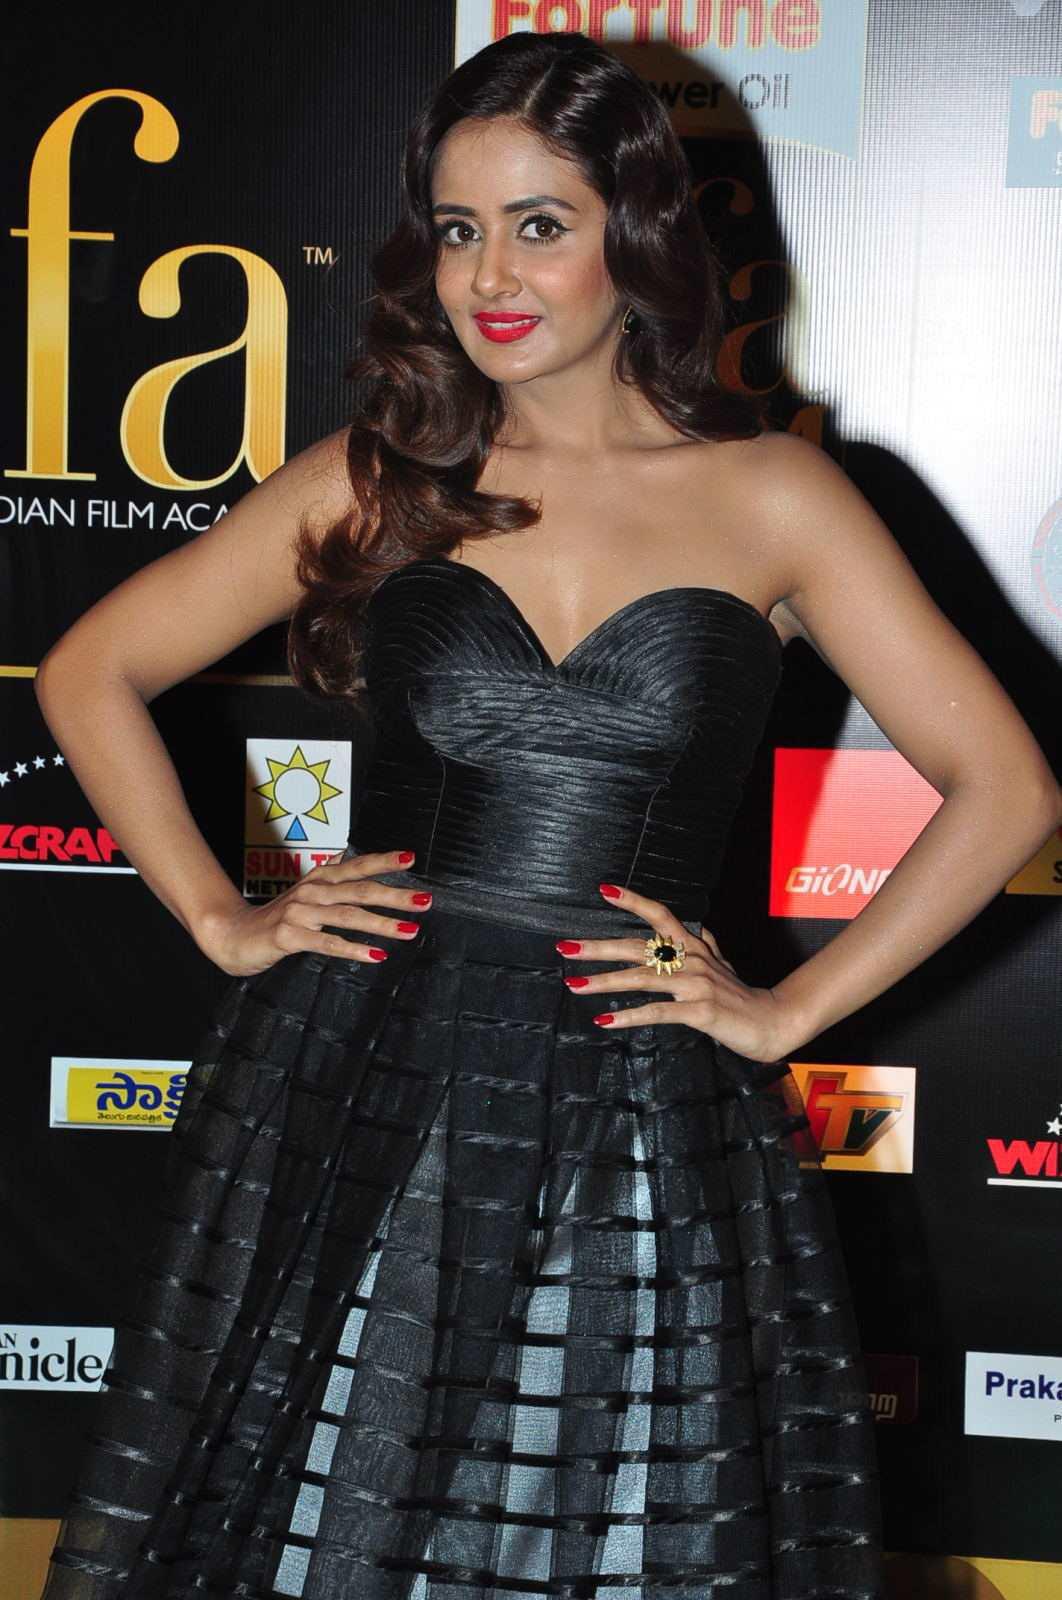 Kannada Actress Parul Yadav In Black Dress At IIFA Awards